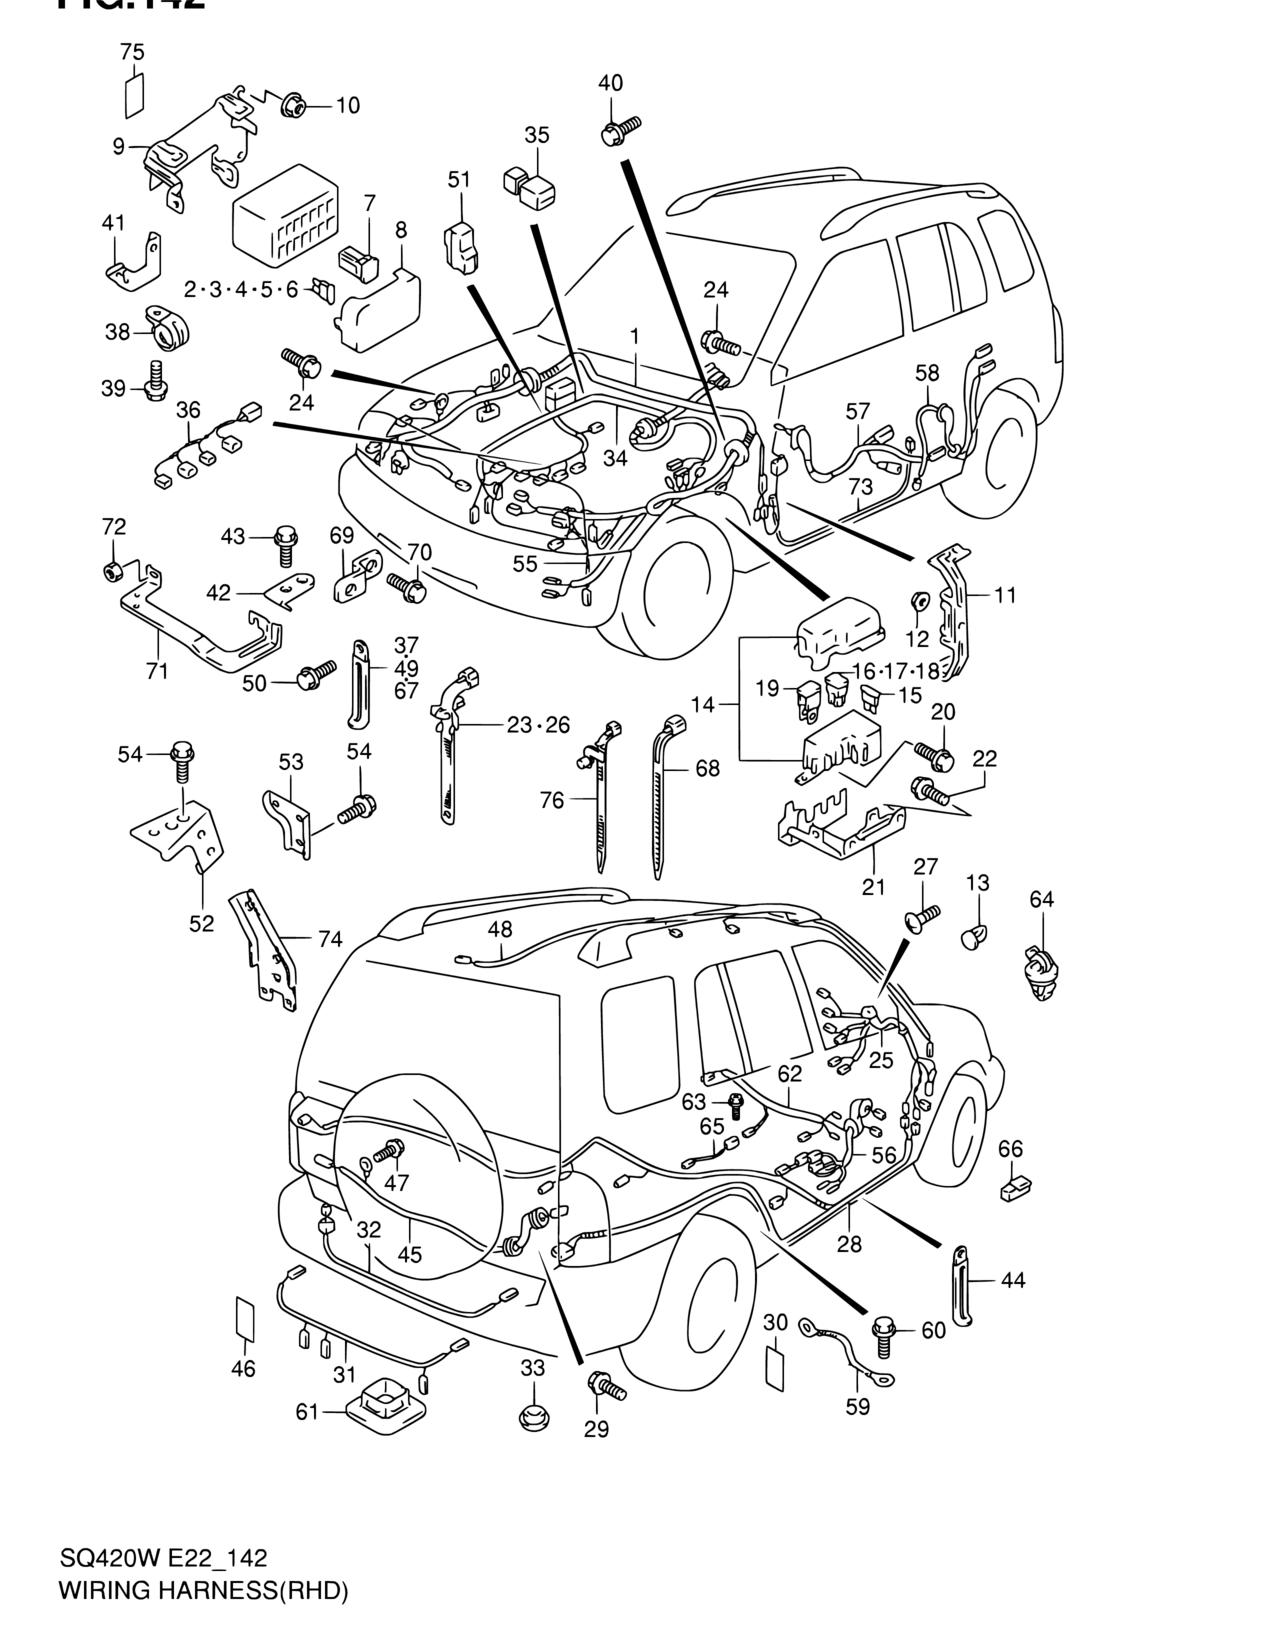 Africa Grand Vitara Sq625w Gvitara Electrical 142 Wiring Suzuki Diagram Parts